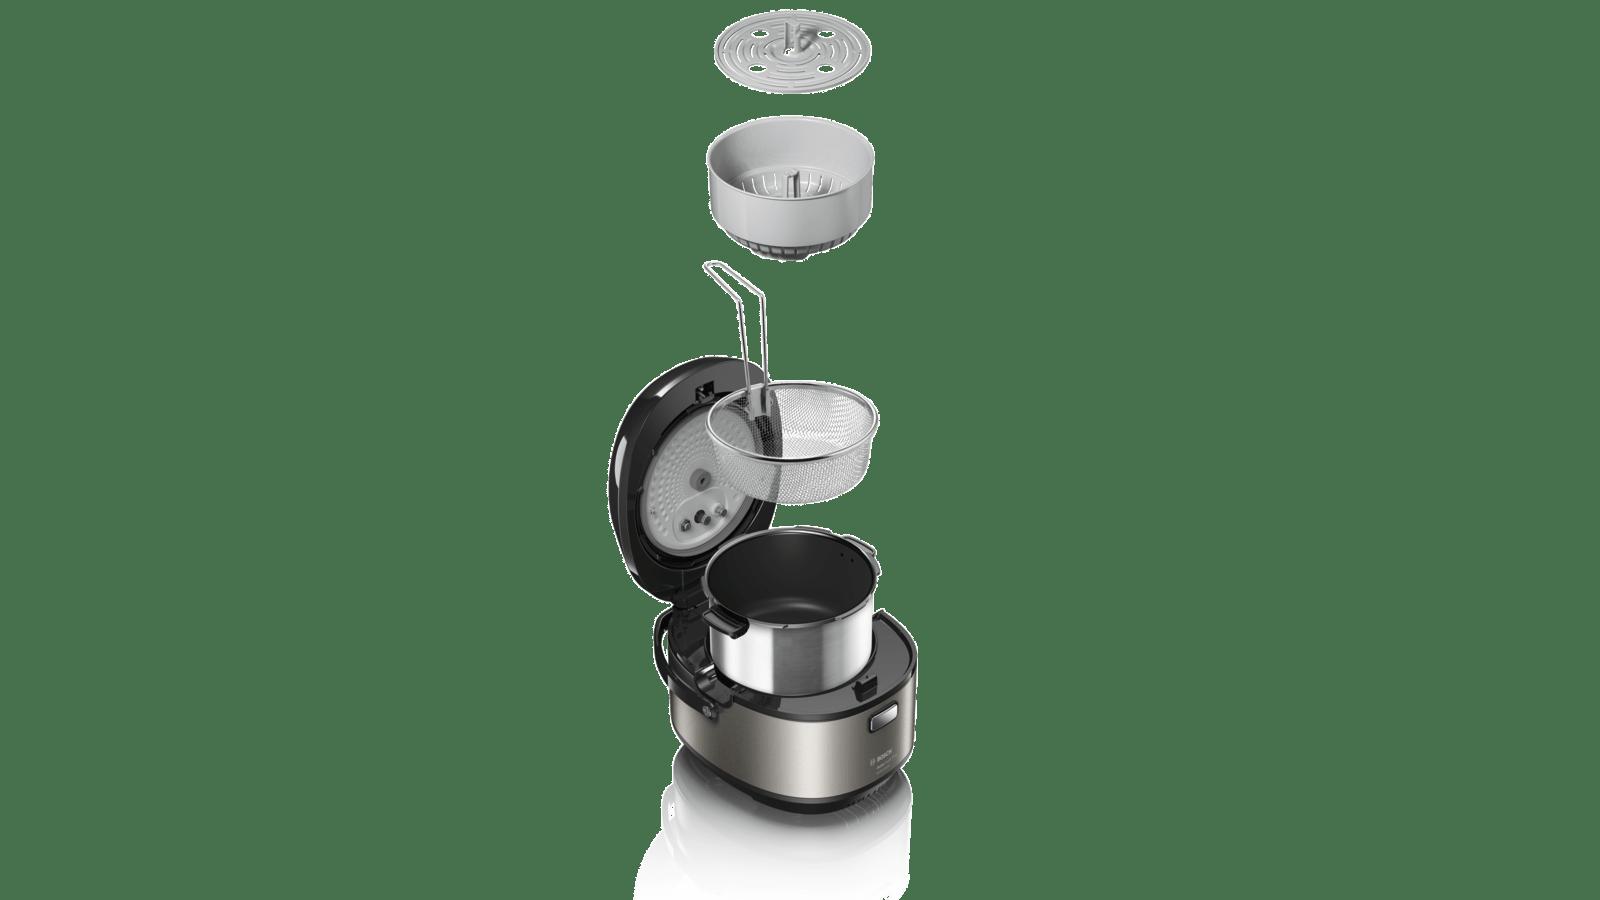 Bosch MUC88B68fr Multi Apple Cooker 1200 W Metallic